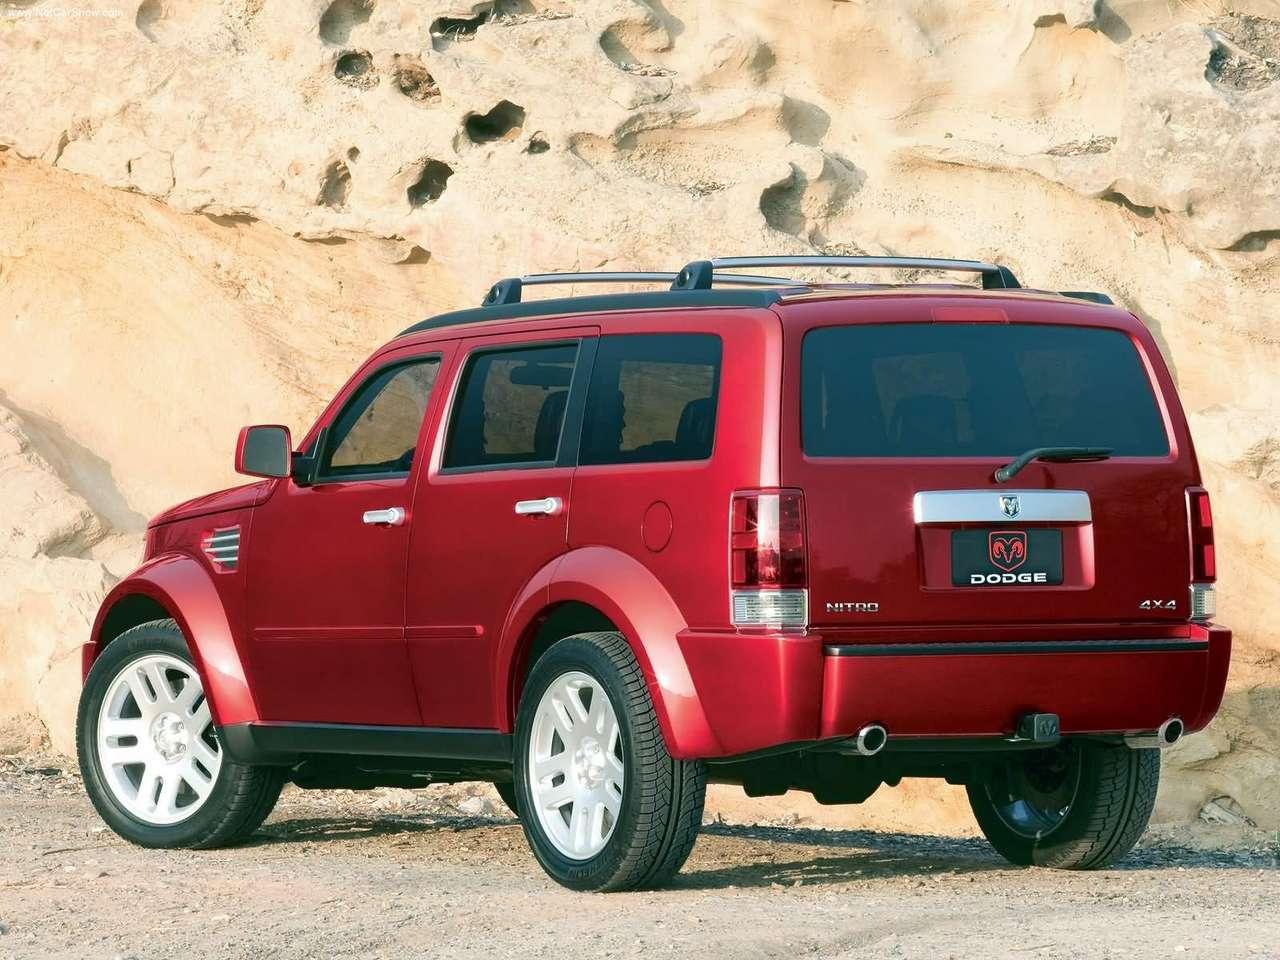 Dodge-2007-nitro